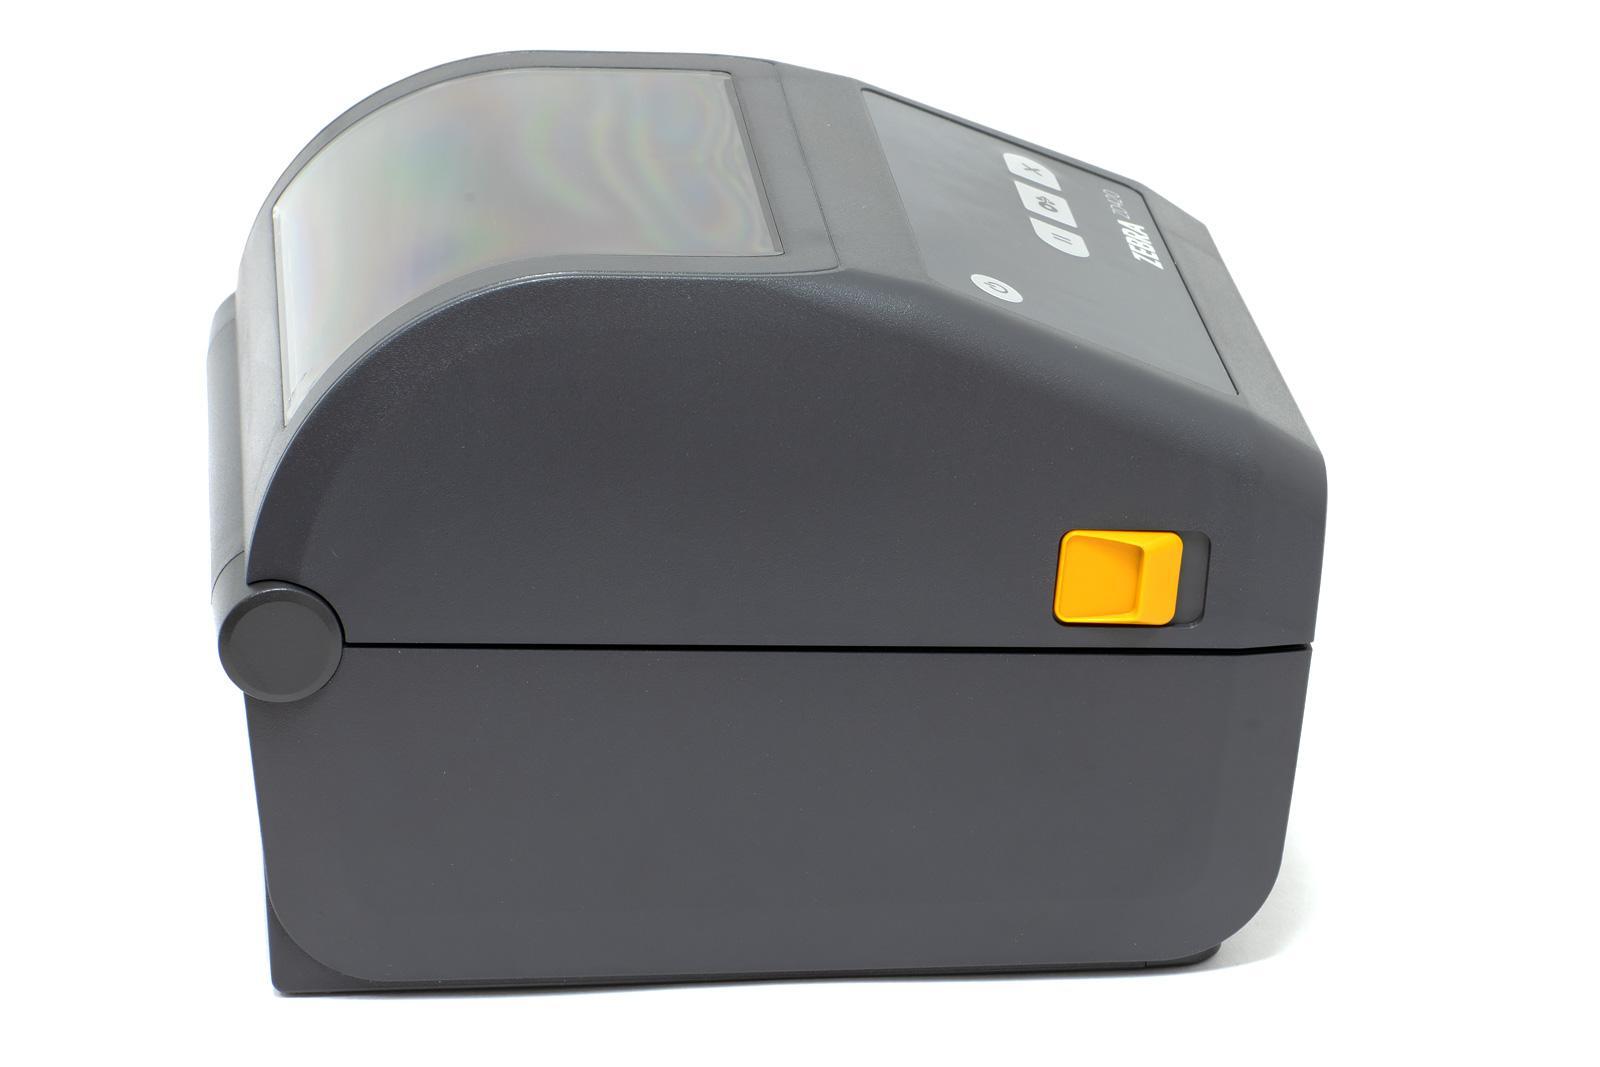 Термопринтер этикеток Zebra ZD420d 300 dpi USB [ZD42043-D0EE00EZ]-1